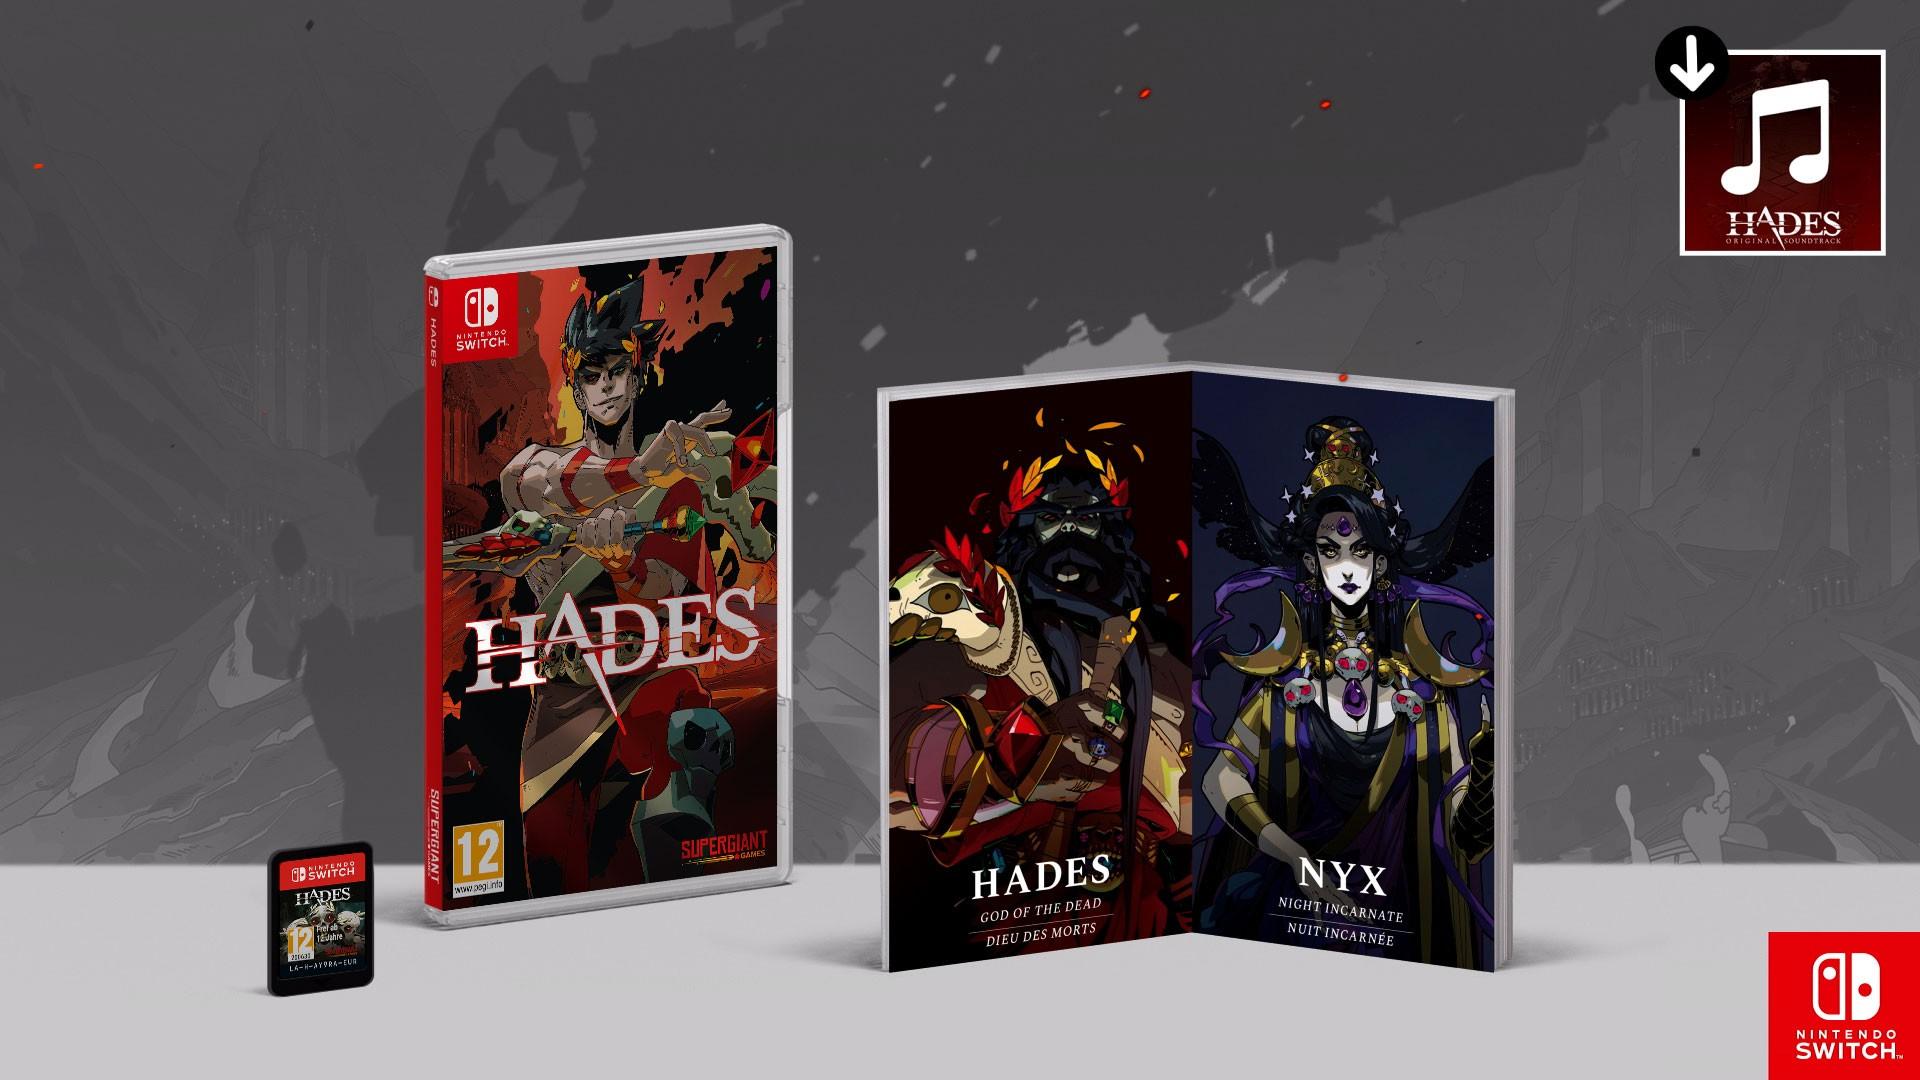 Hades Collector's Edition